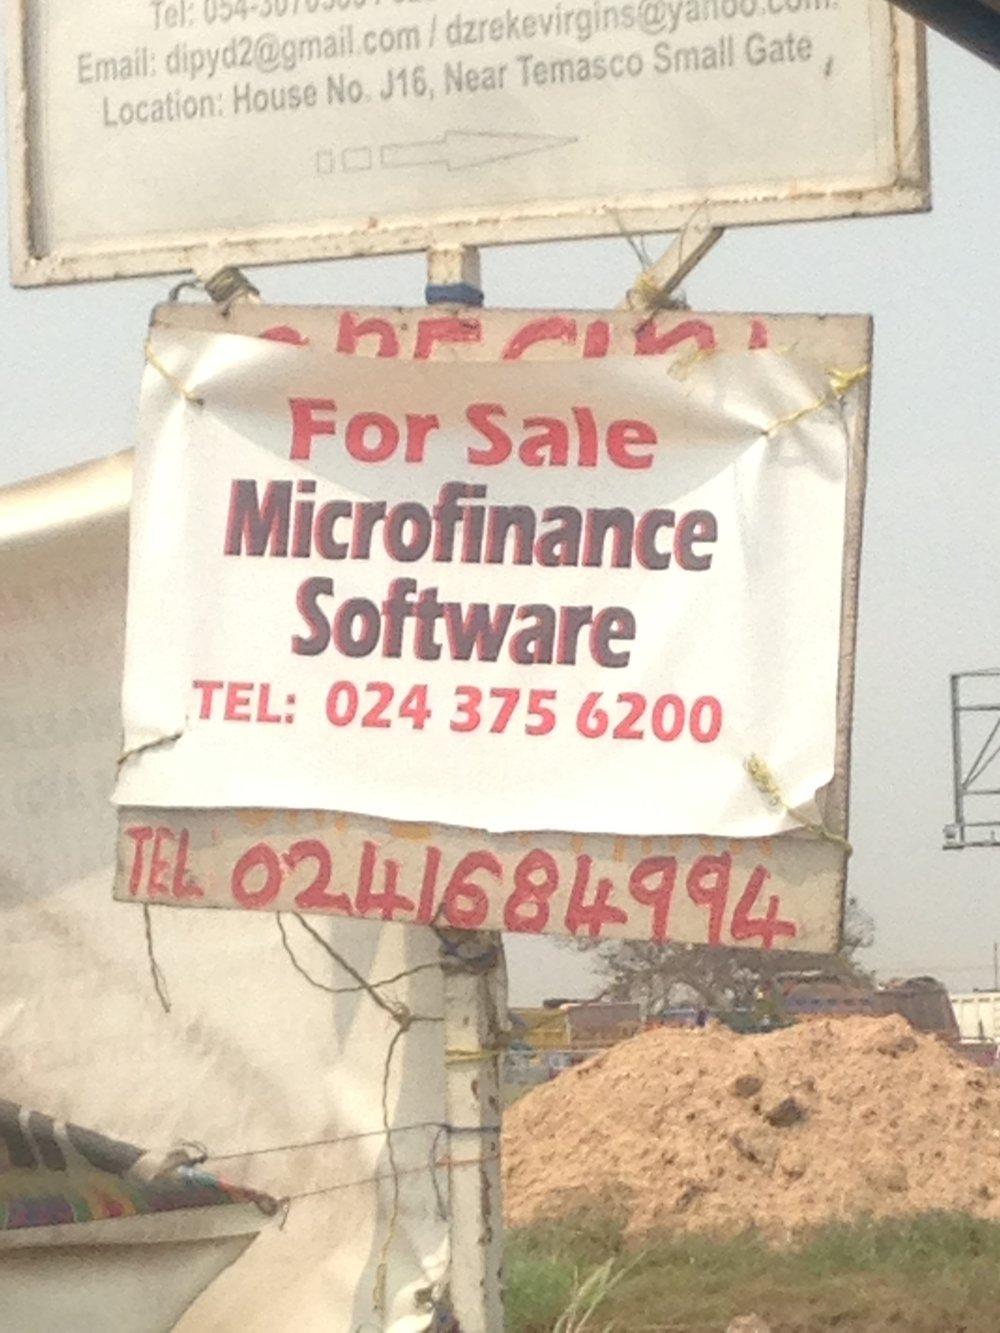 Microfinance2.jpg